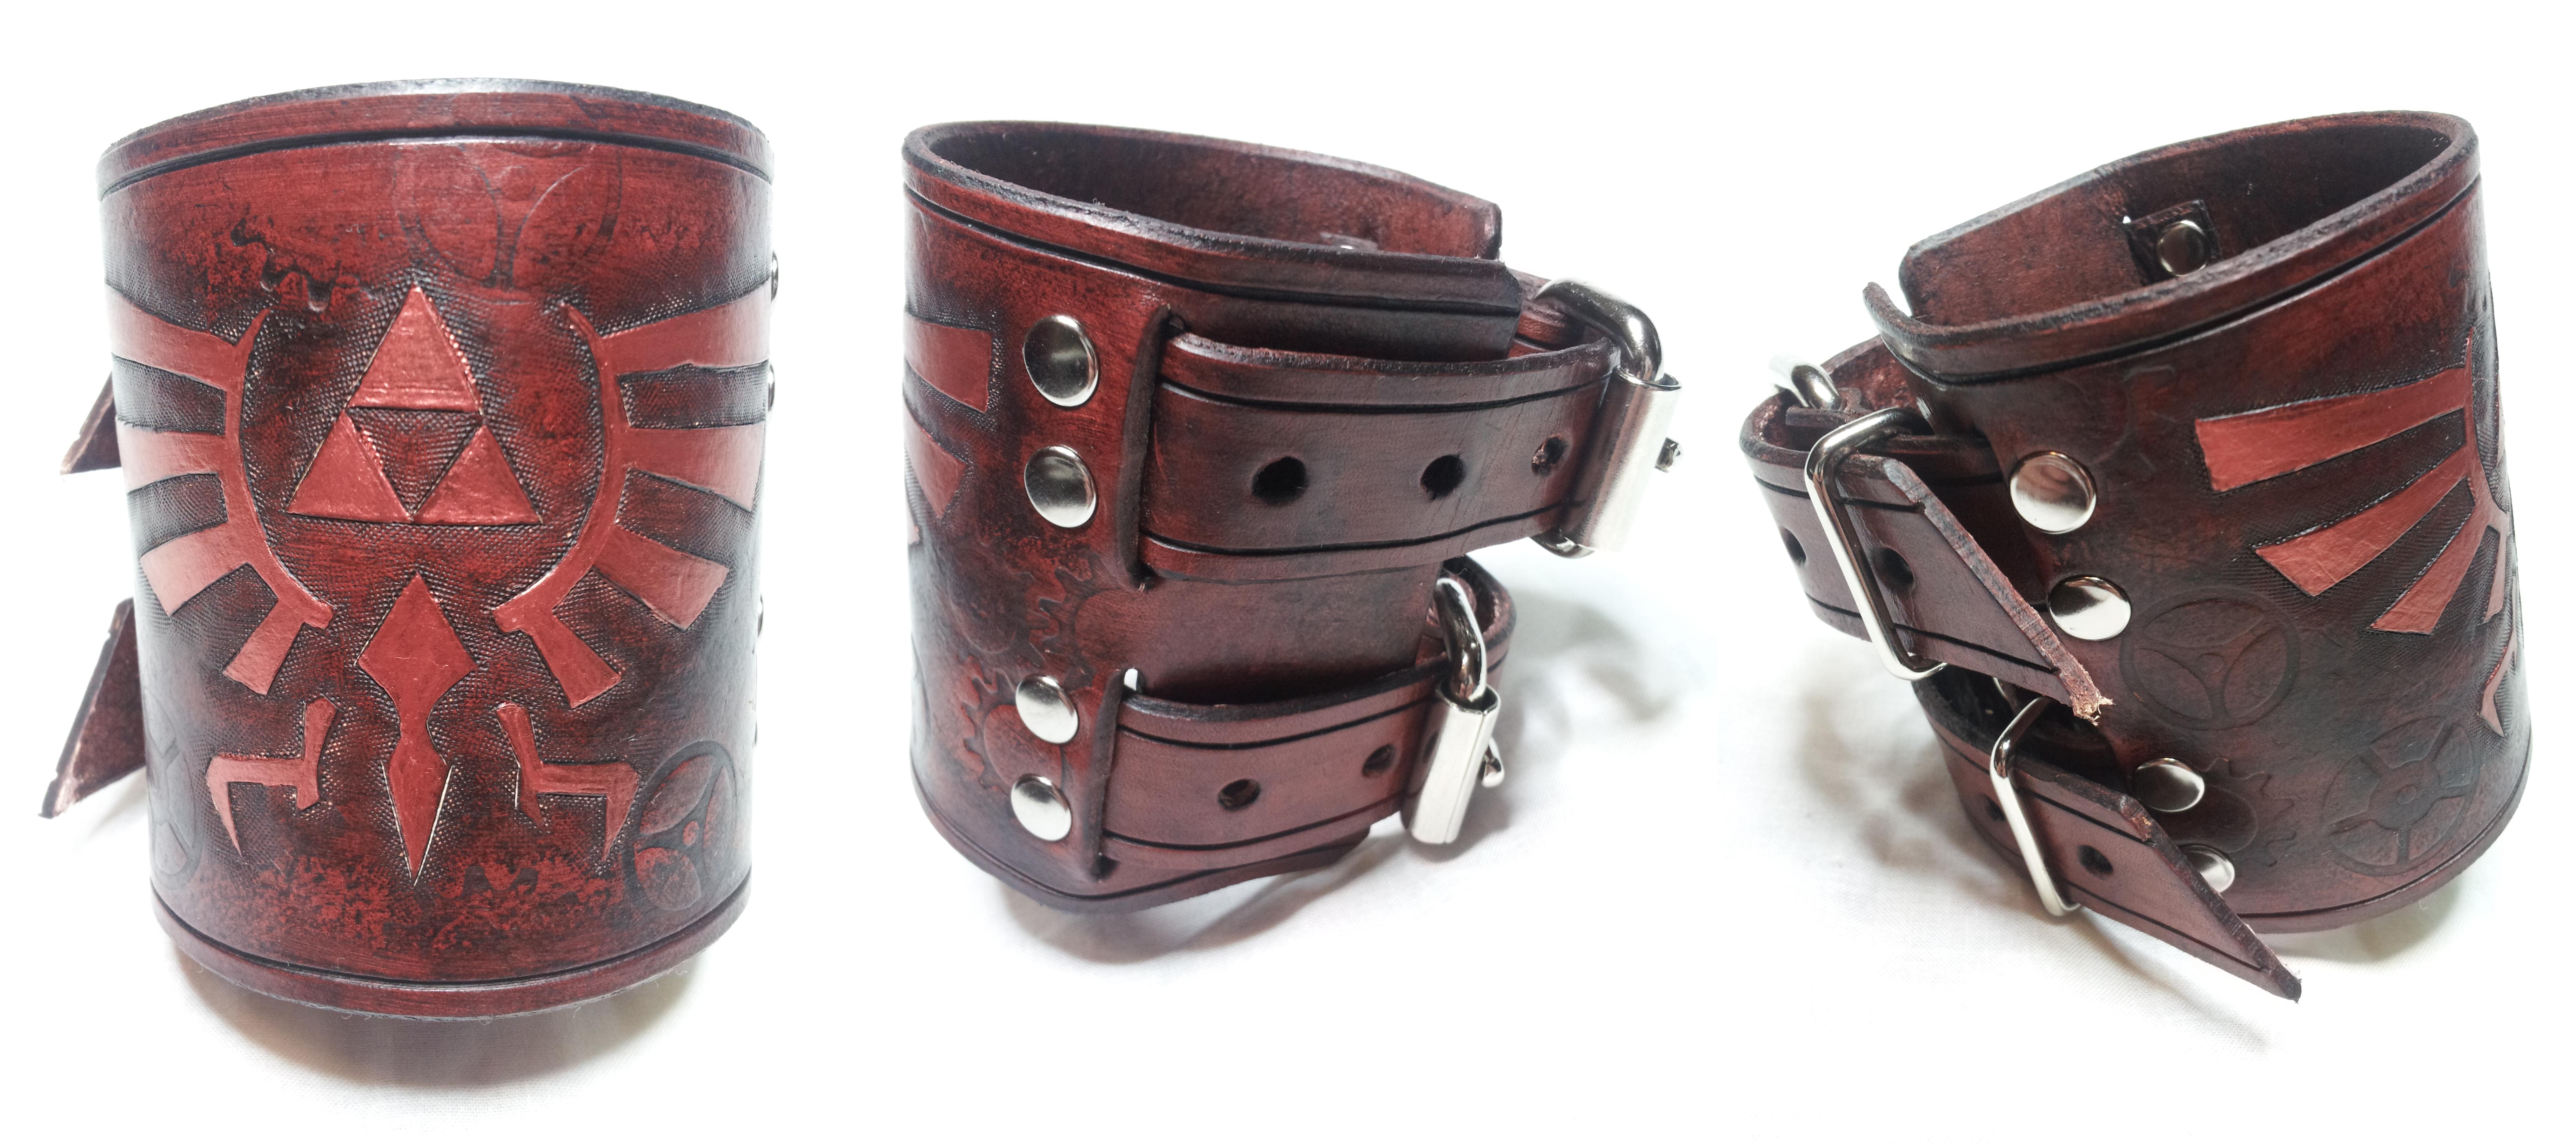 Steampunk Legend of Zelda Bracelet / Wrist Cuff by deadlanceSteamworks